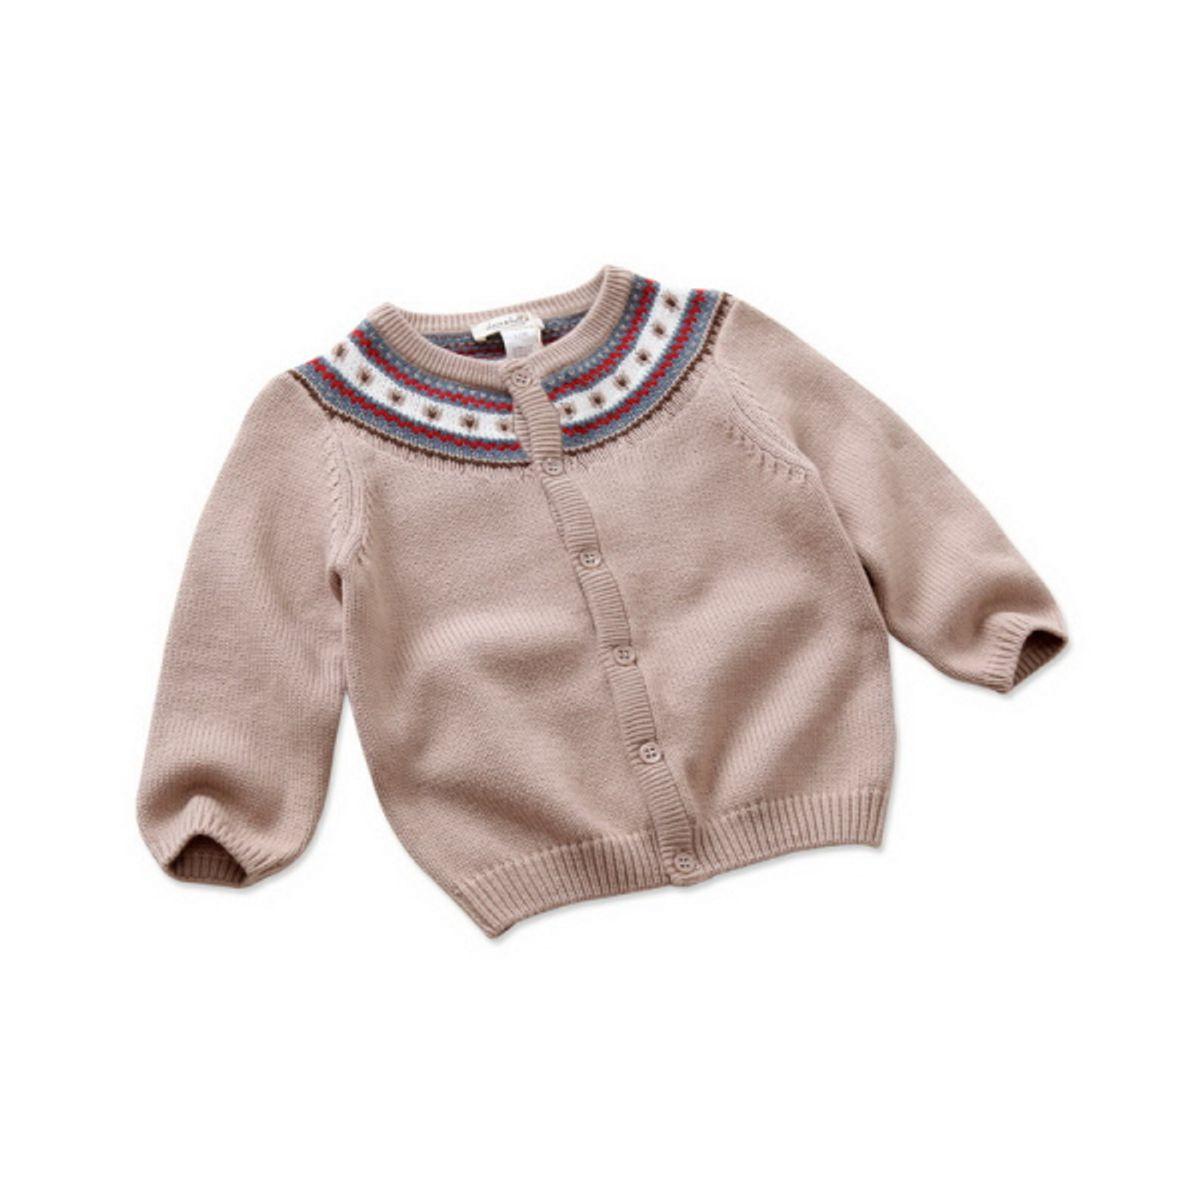 Brown designer cardigan